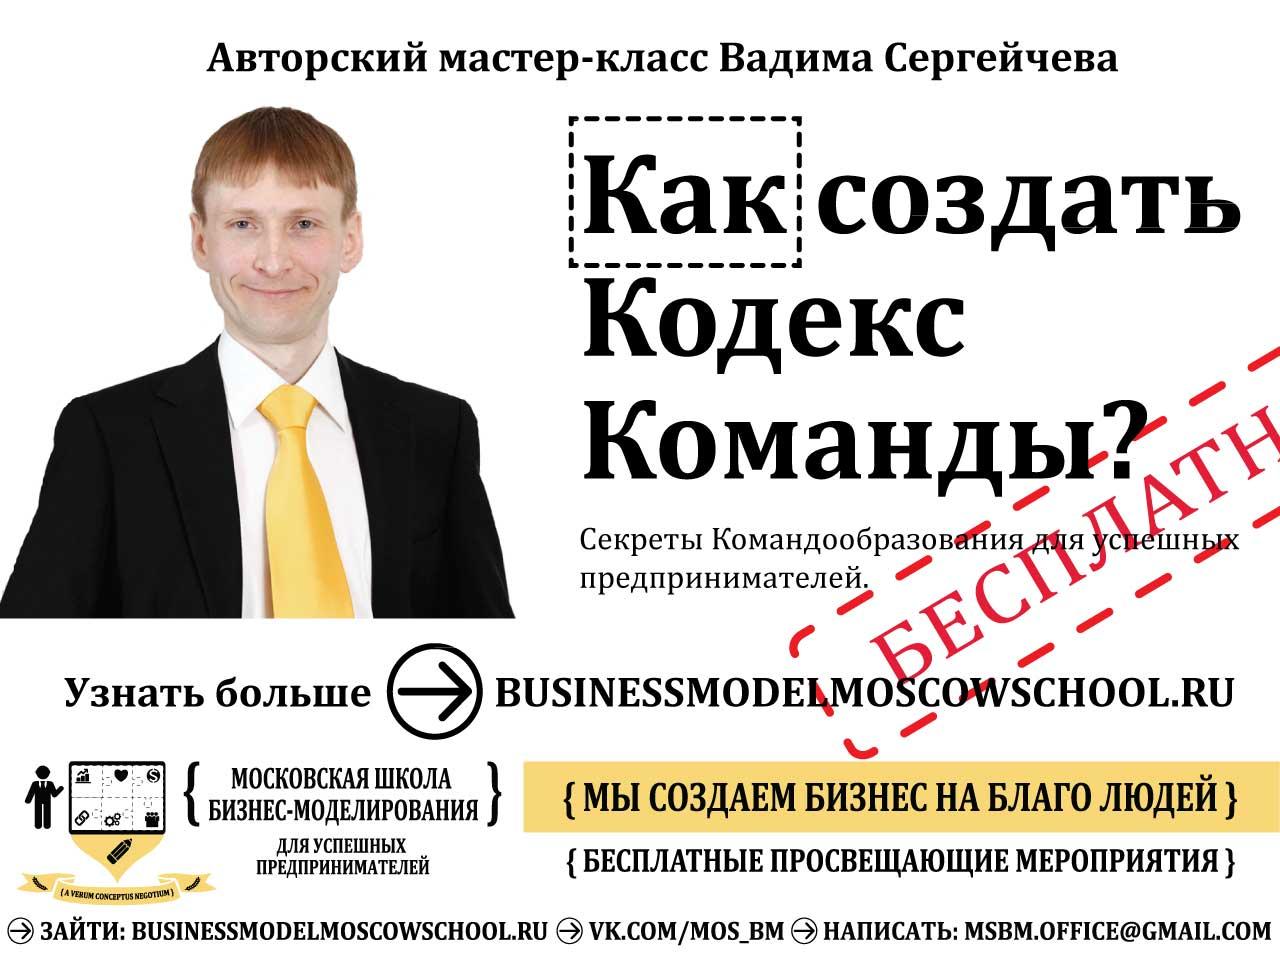 business_model_moscow_school_mclass_NEW_flyer_1.3_CODECS